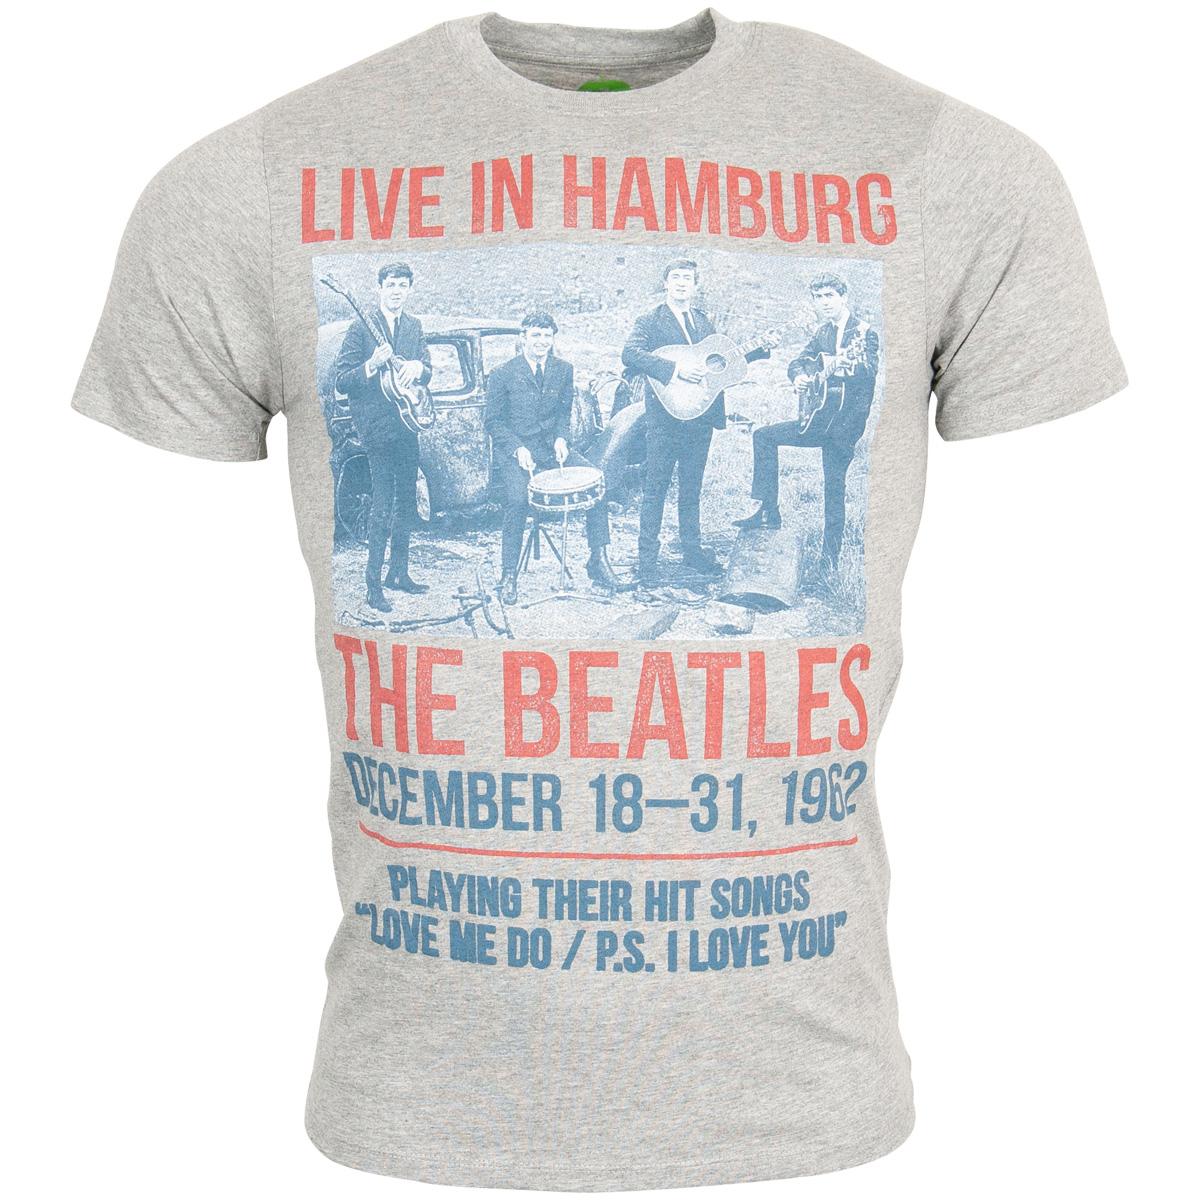 The Beatles - 1962 Live in Hamburg T-Shirt - grau